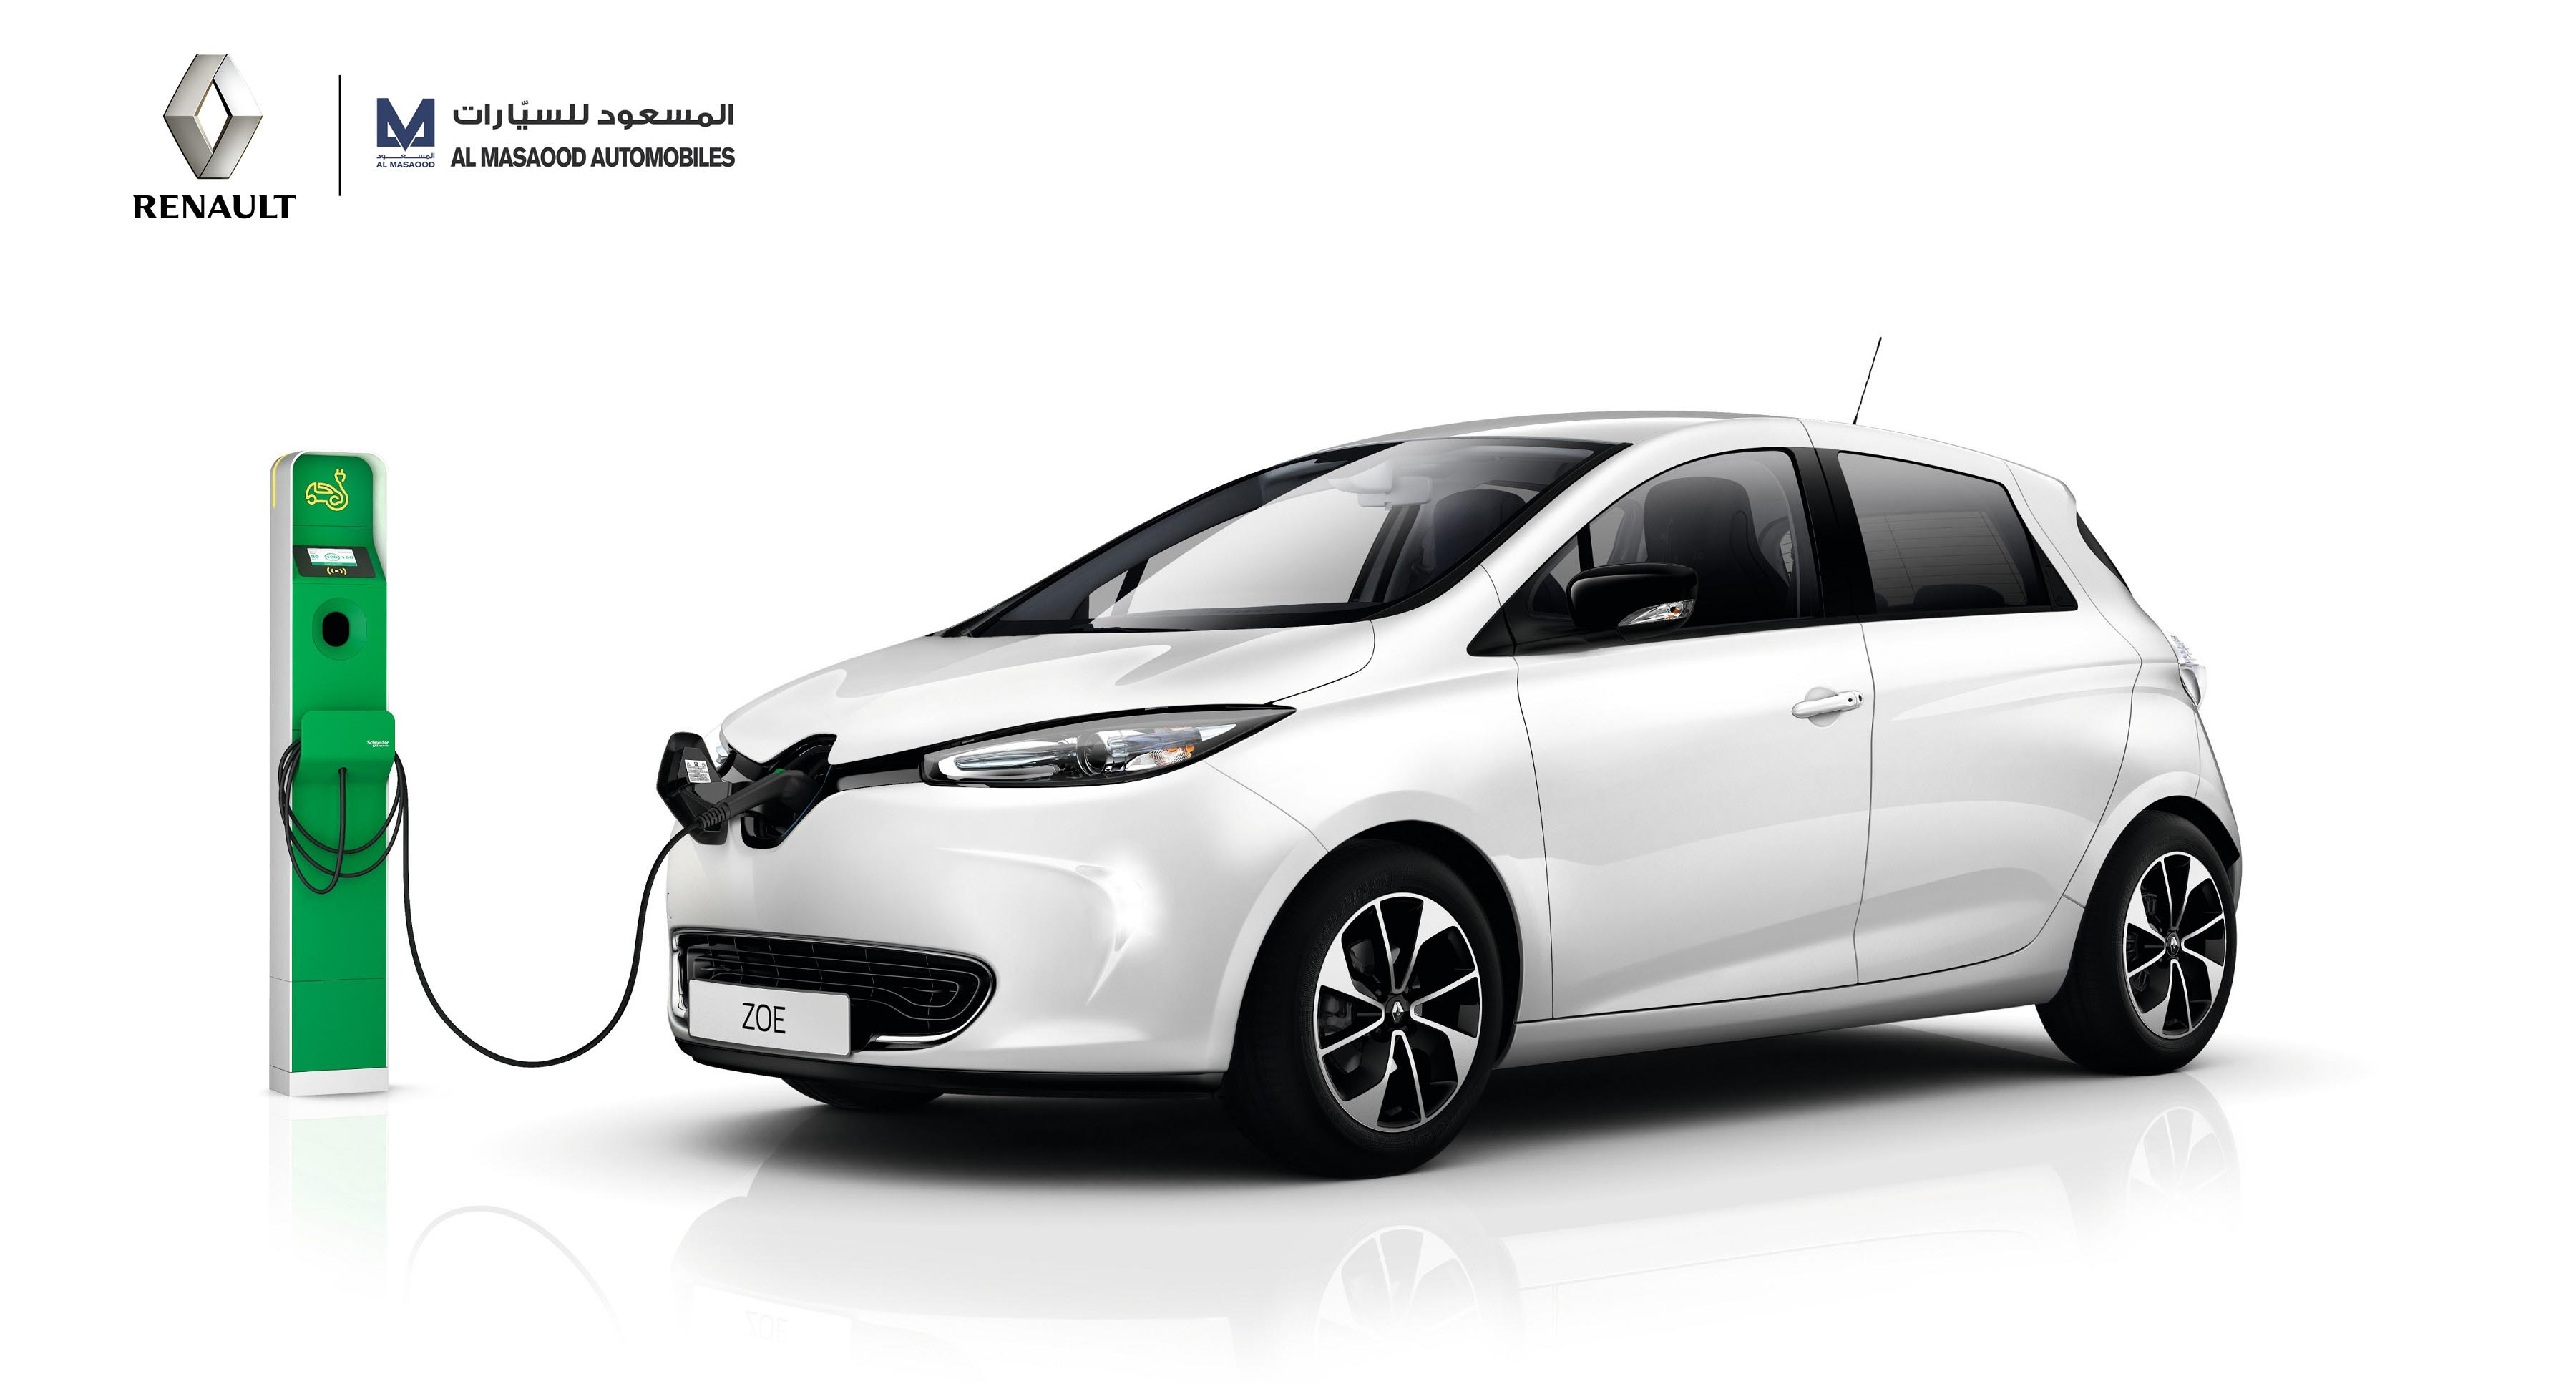 Al Masaood Automobiles Launches Latest Renault Zoe in Abu Dhabi